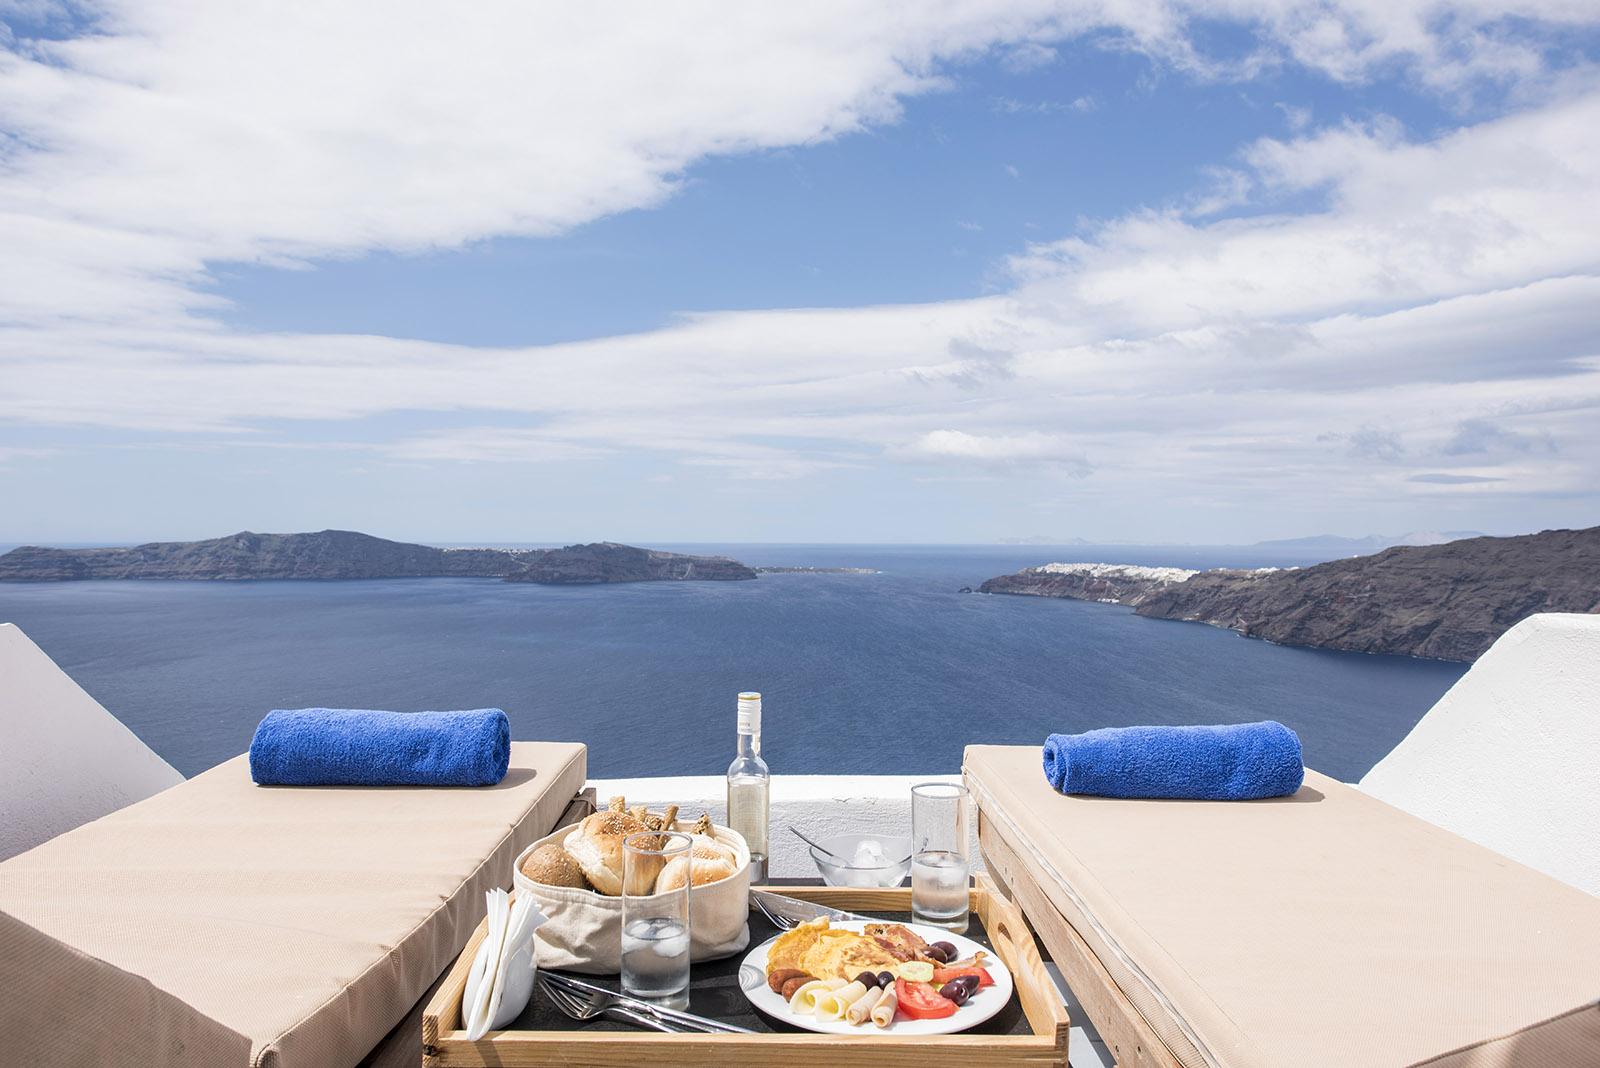 santorini accommodation - Gizis Exclusive Santorini Greece